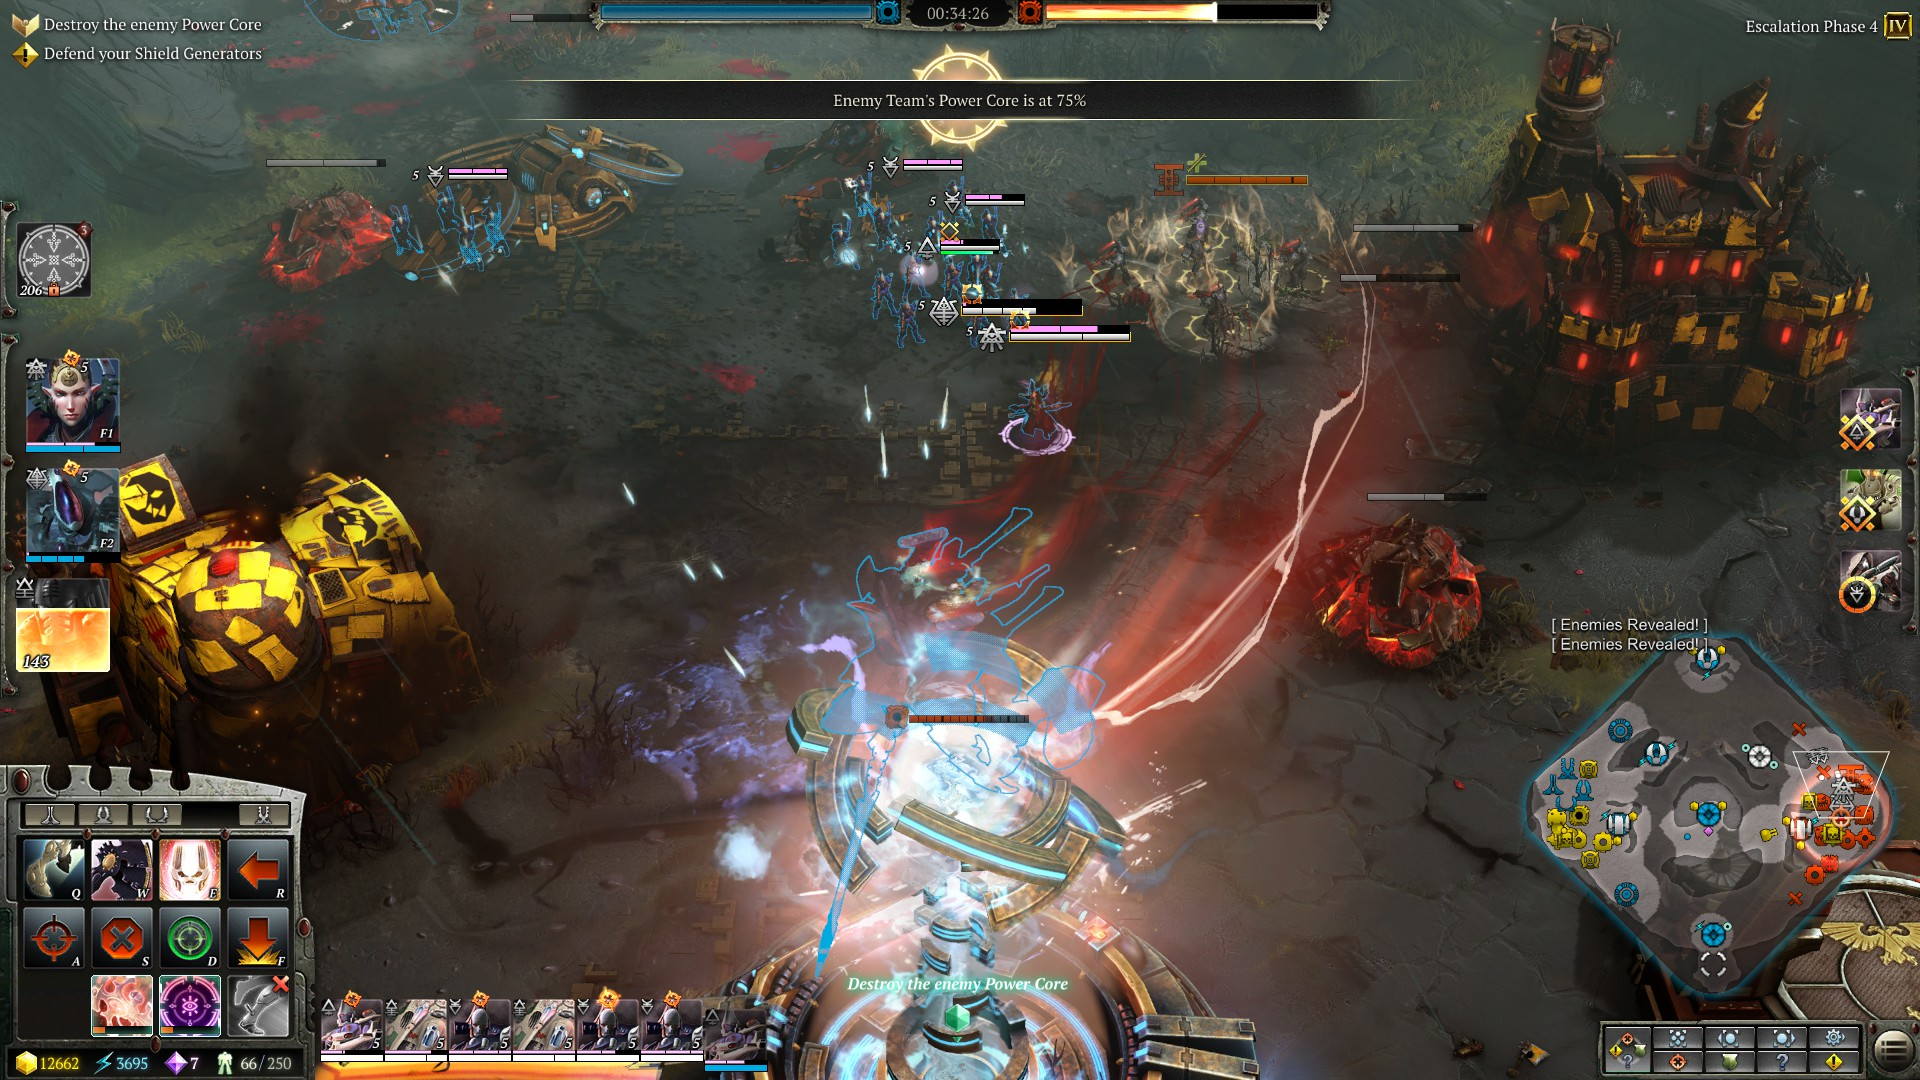 Warhammer 40K: Dawn of War 3 review: Twilight struggle | Ars Technica